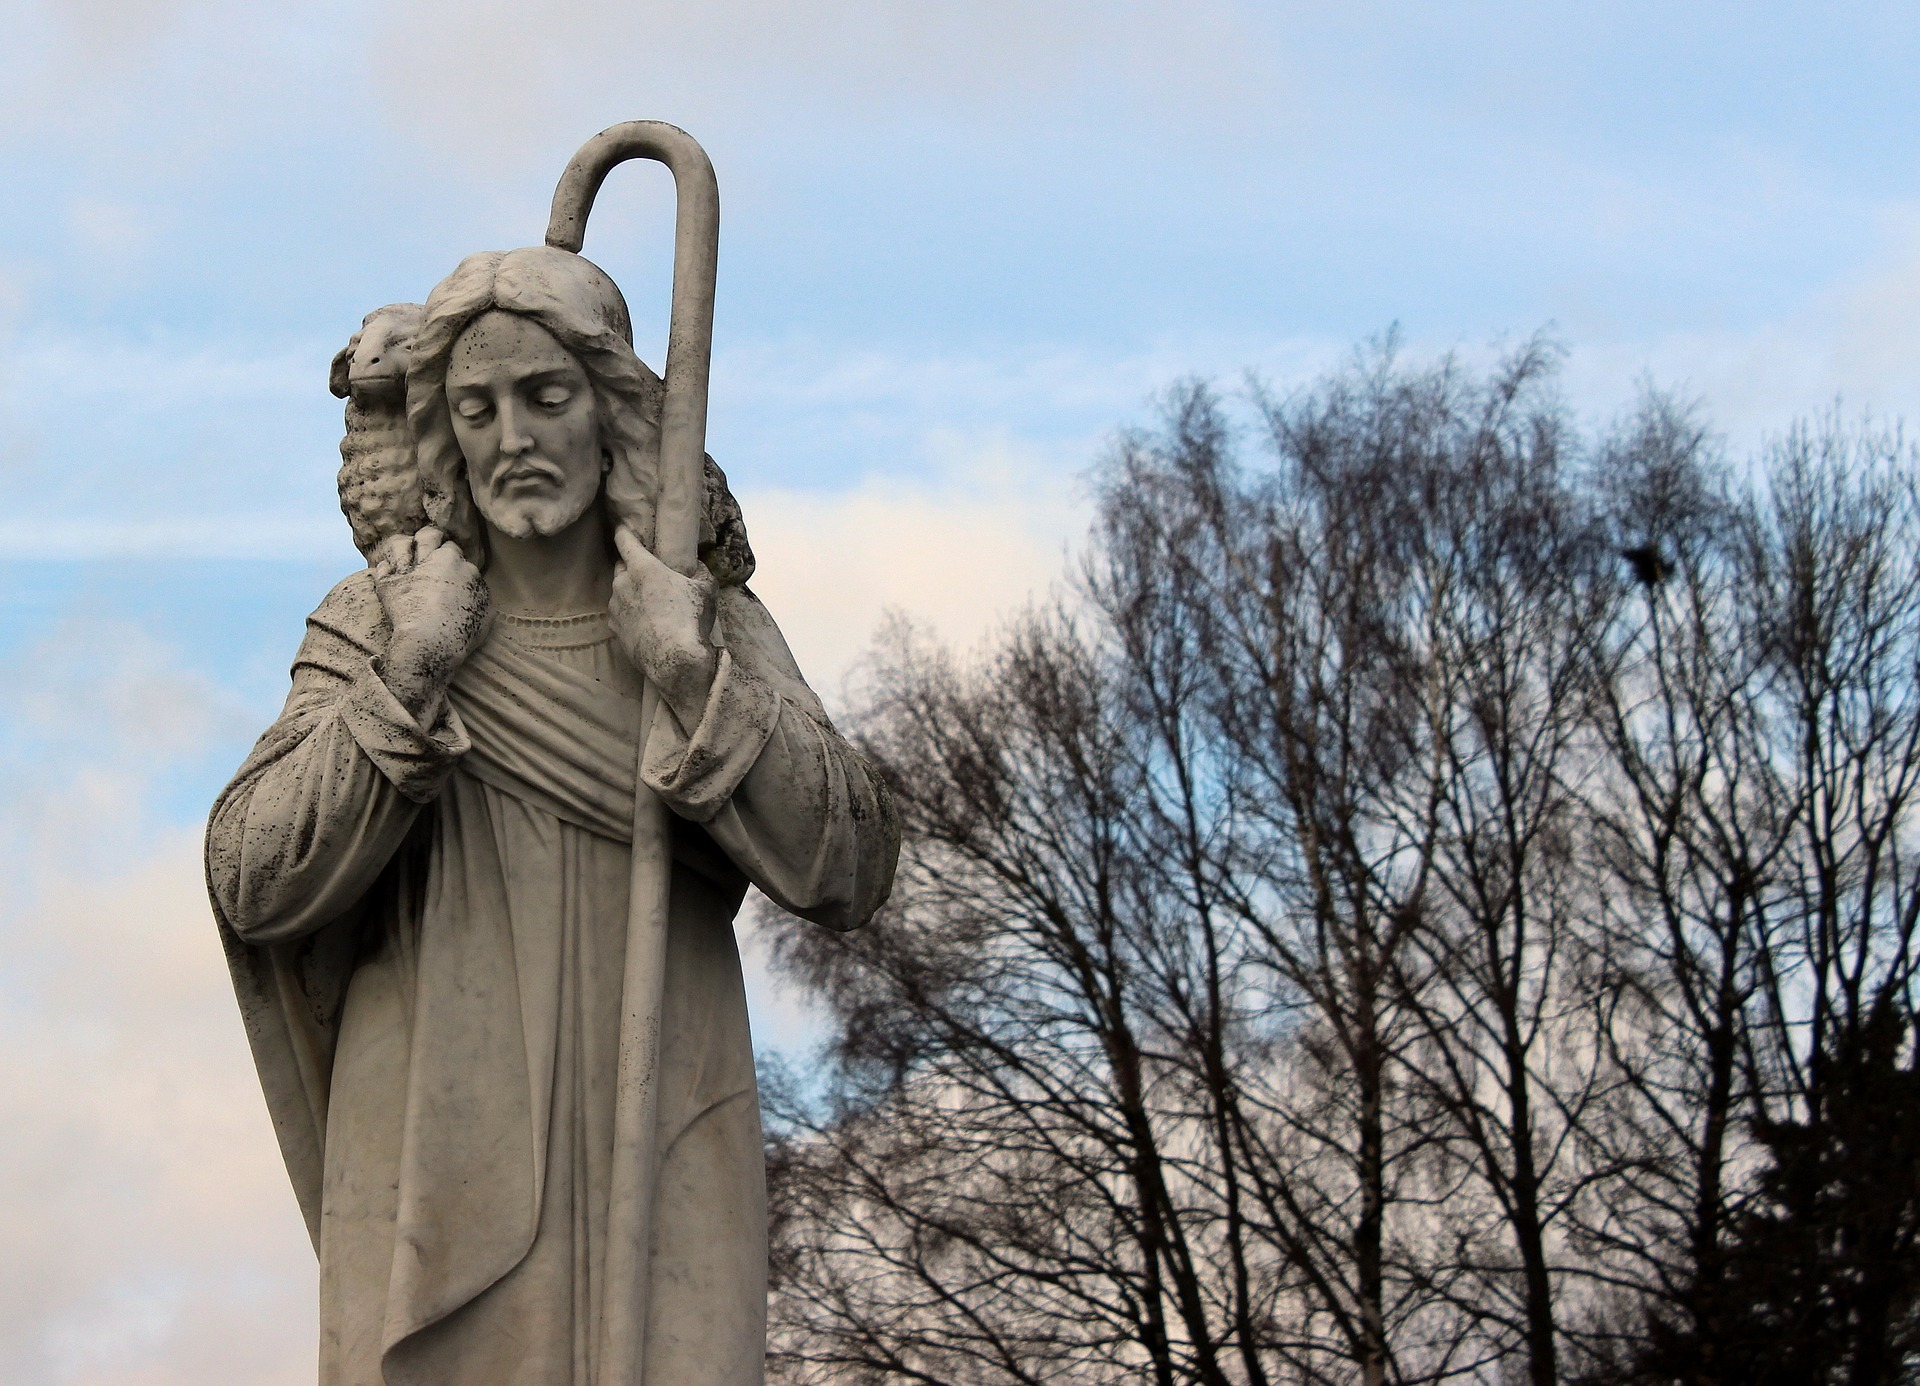 Jesus Sculpture, Carve, Fig, Figure, Jesus, HQ Photo